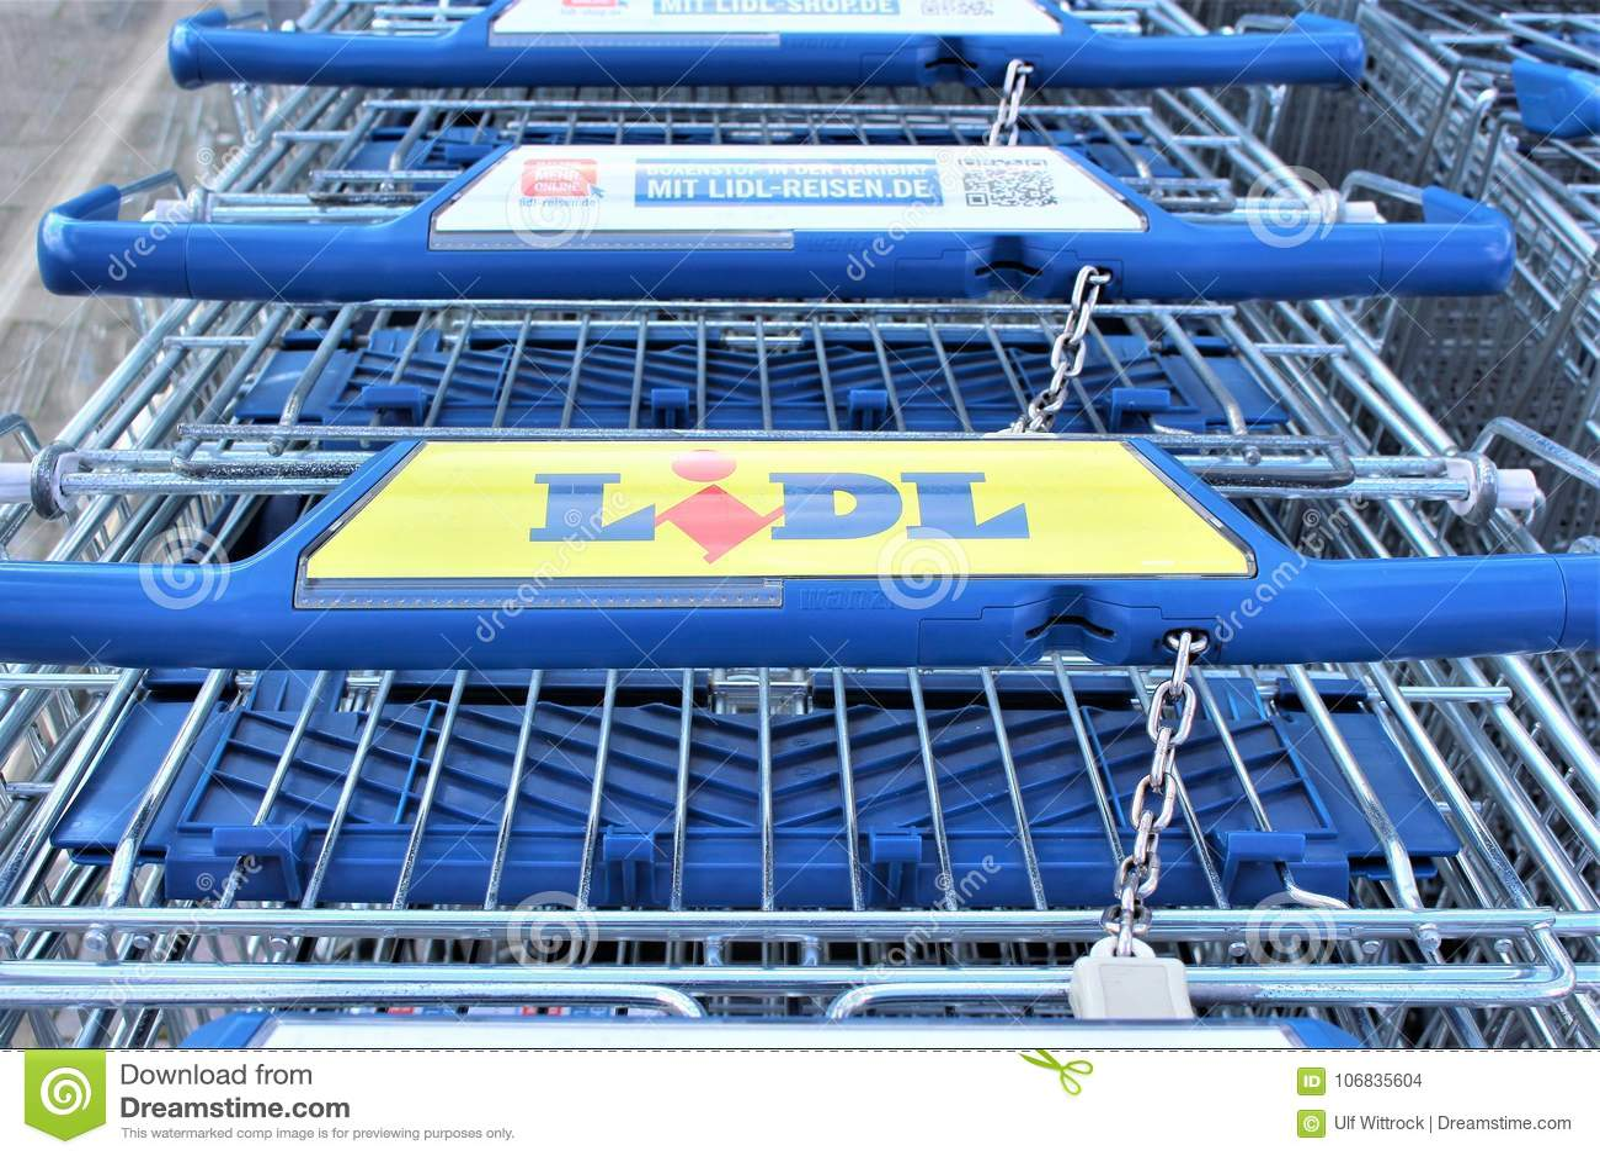 An Image Of A LIDL Supermarket Logo - Melle/Germany - 08/06